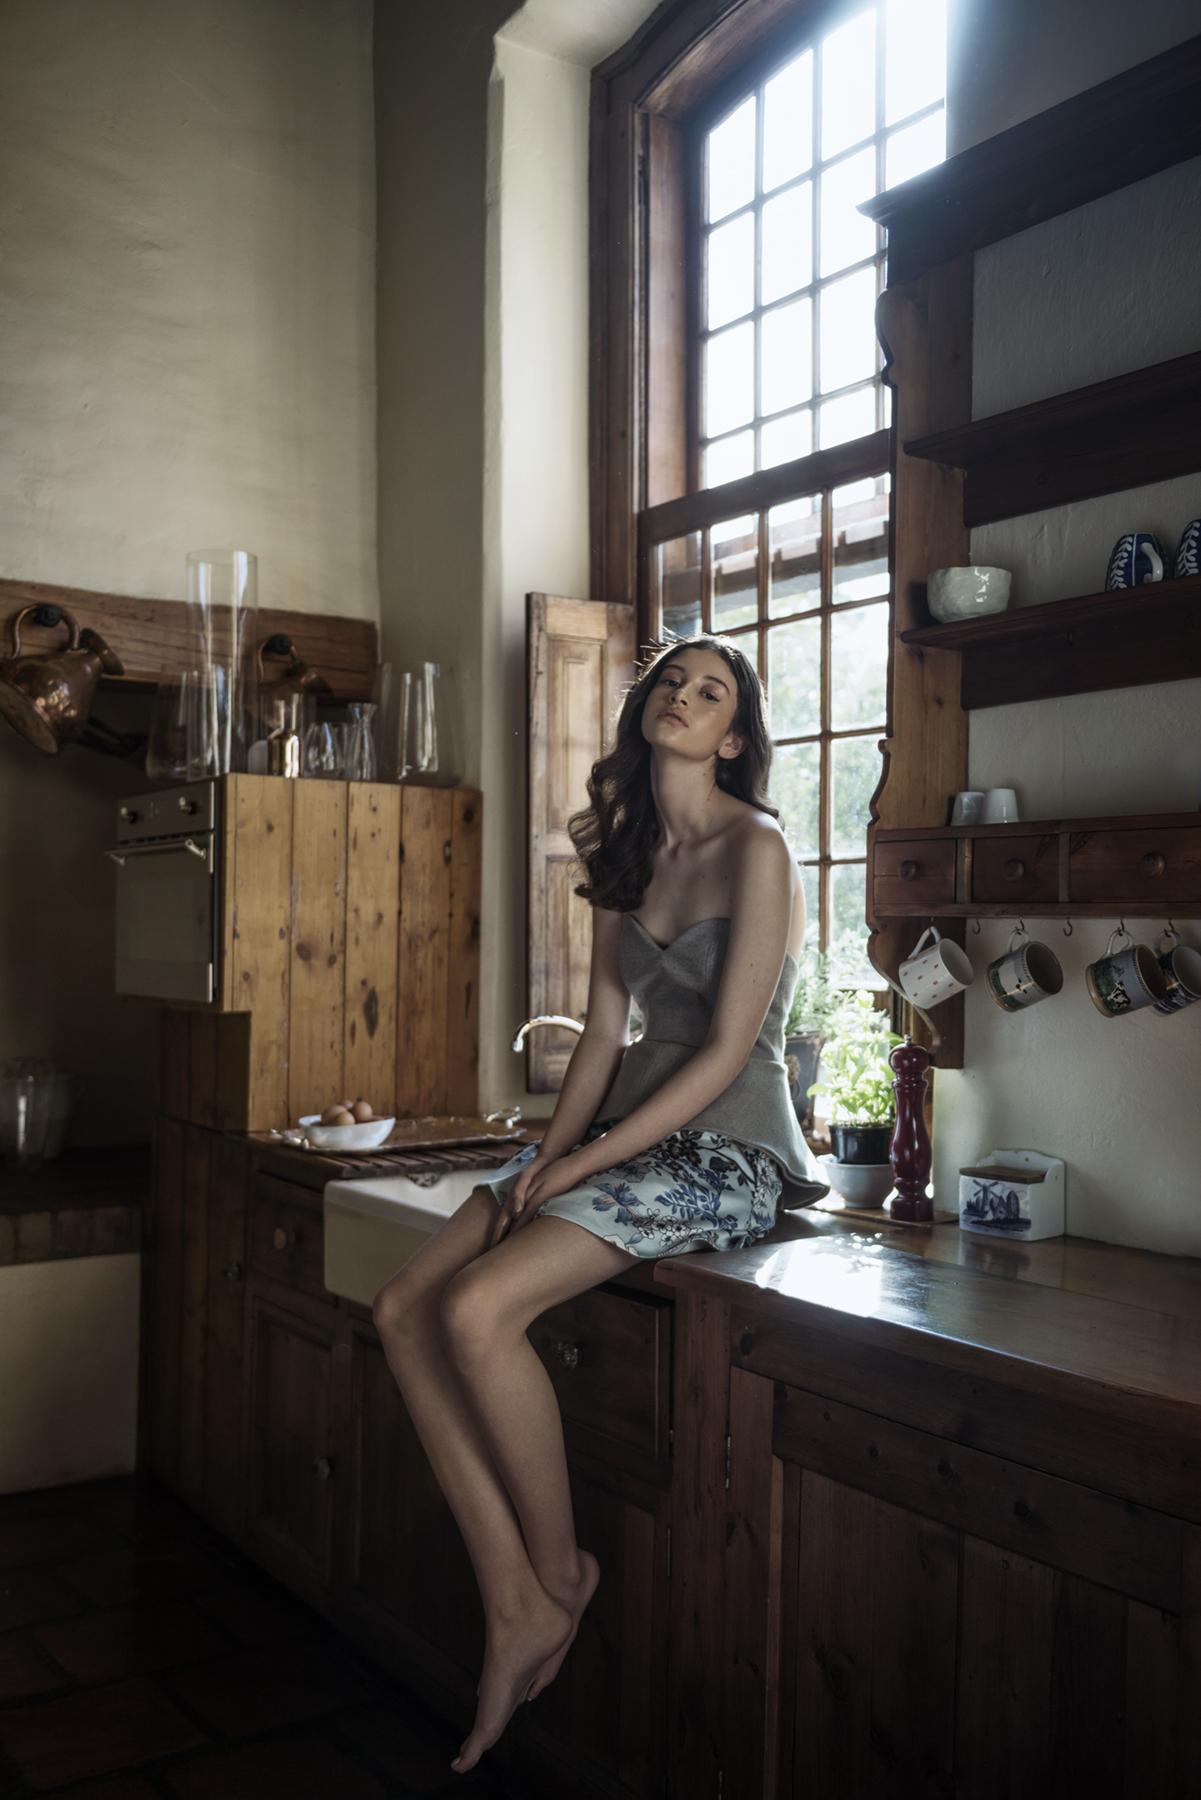 the-house-sitter-anika-molnar-kim-davidson-1.jpg